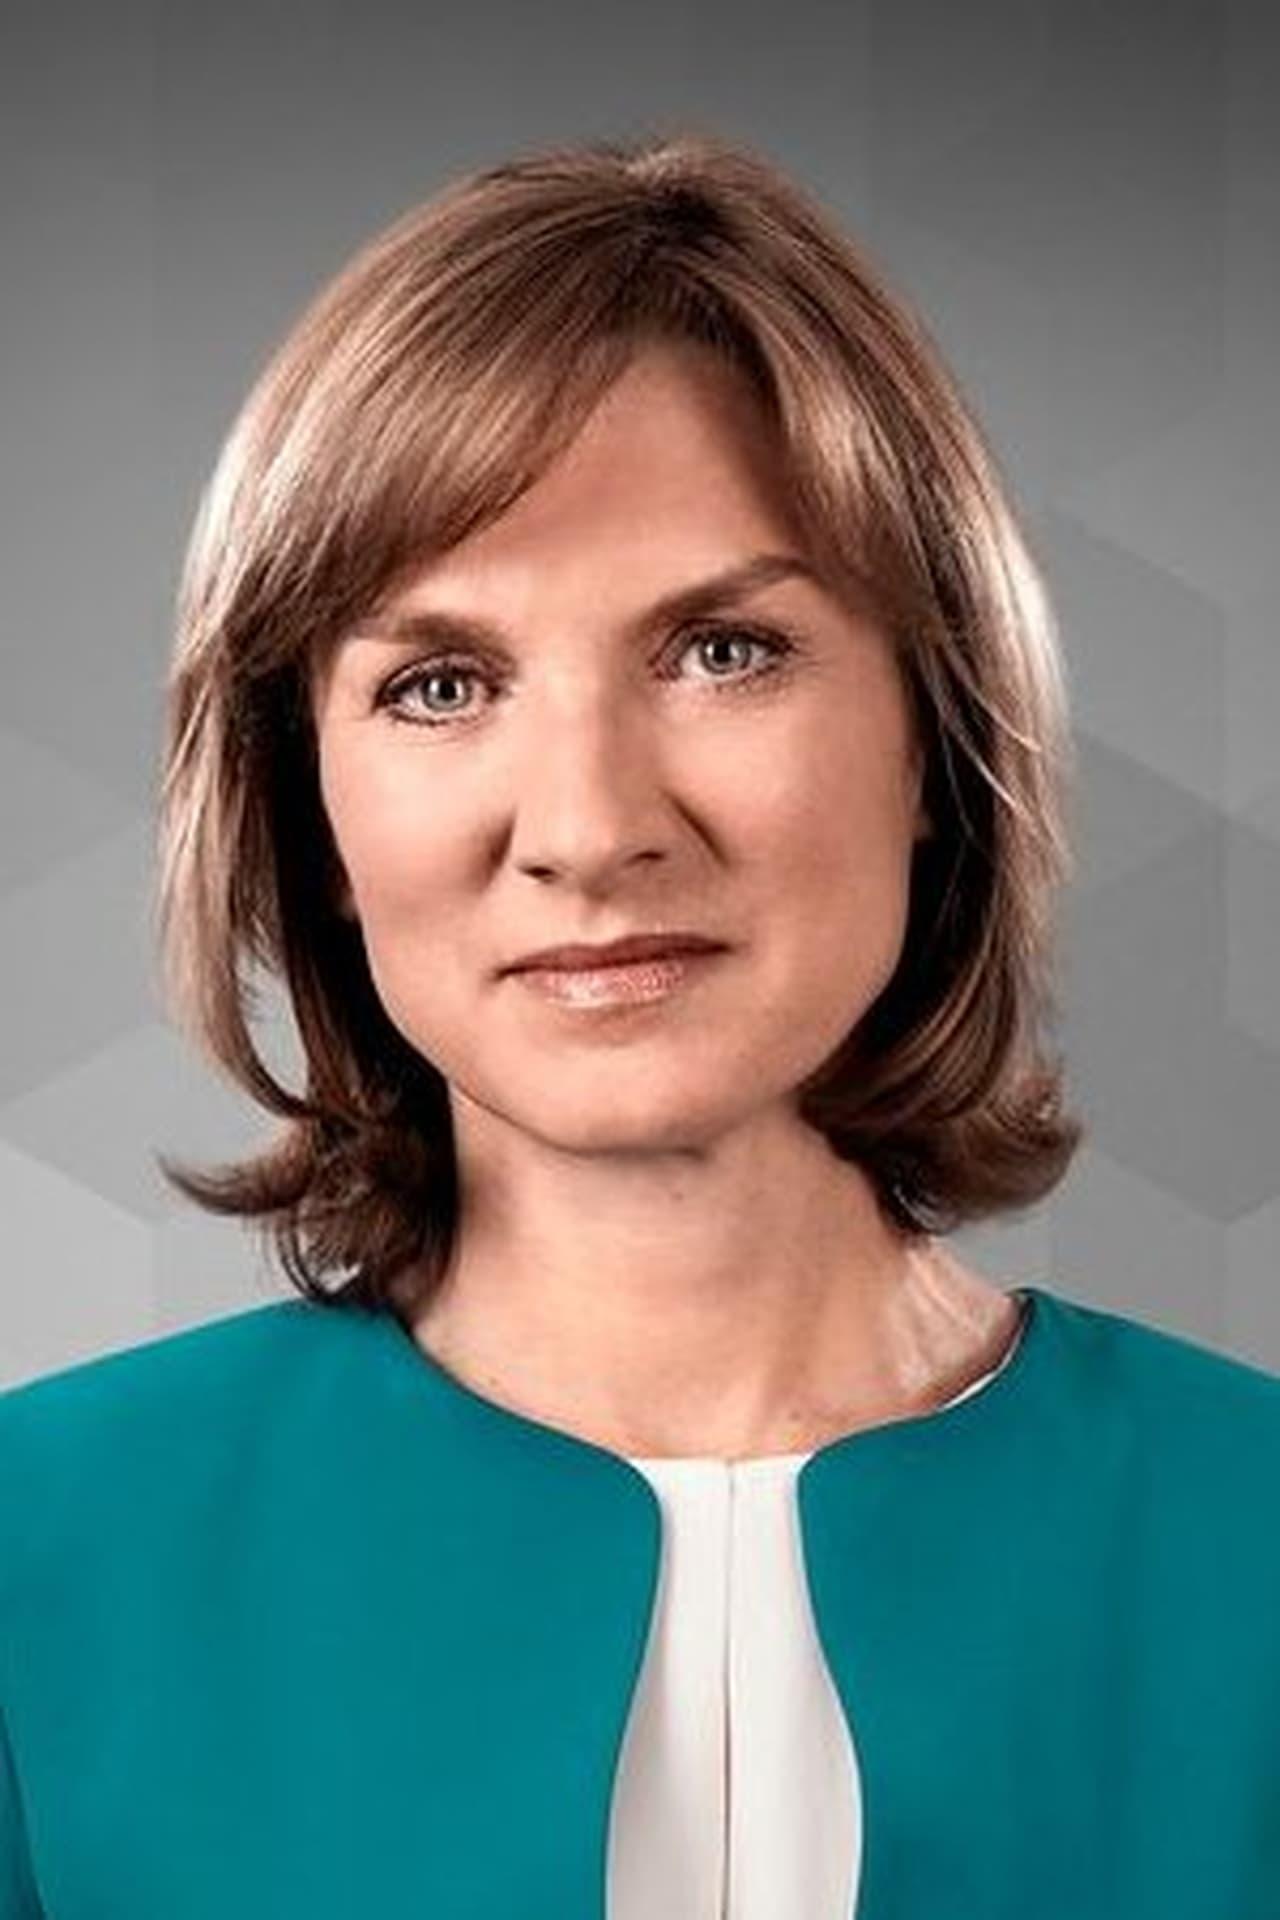 Fiona Bruce